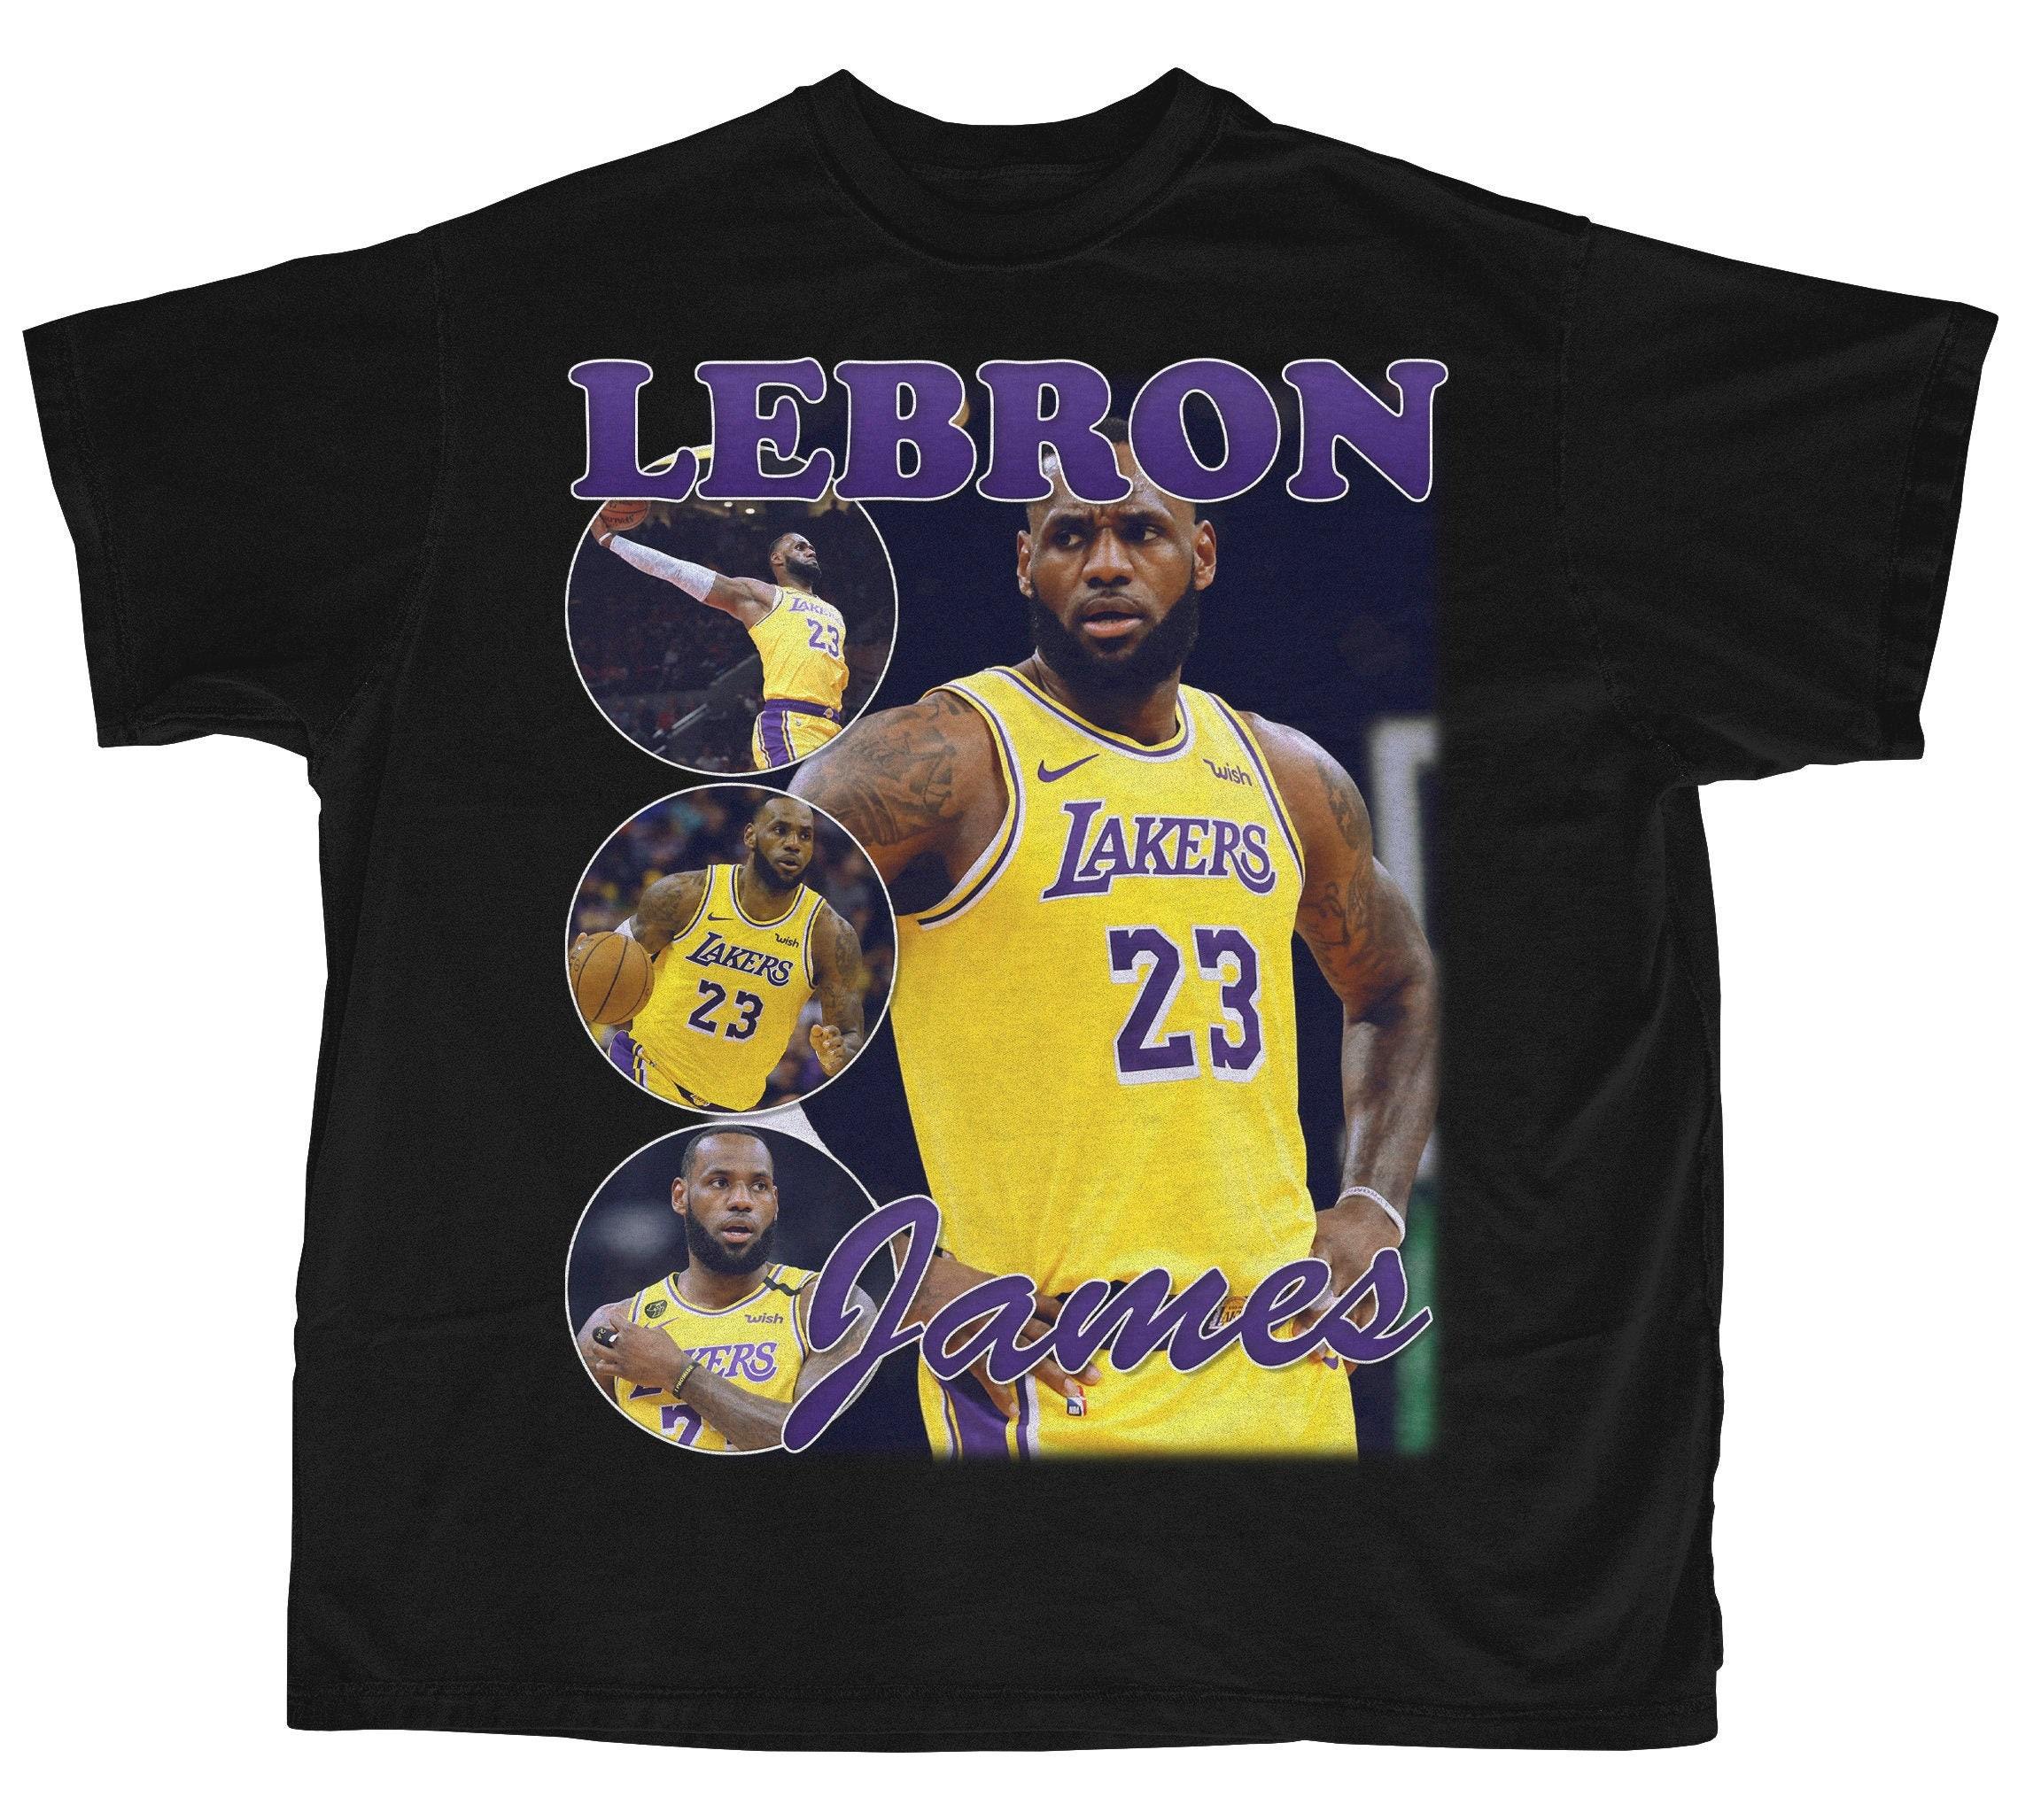 Lebron James Shirt   Bootleg Rap Tee   Short-Sleeve Unisex Black Vintage Style T-Shirt